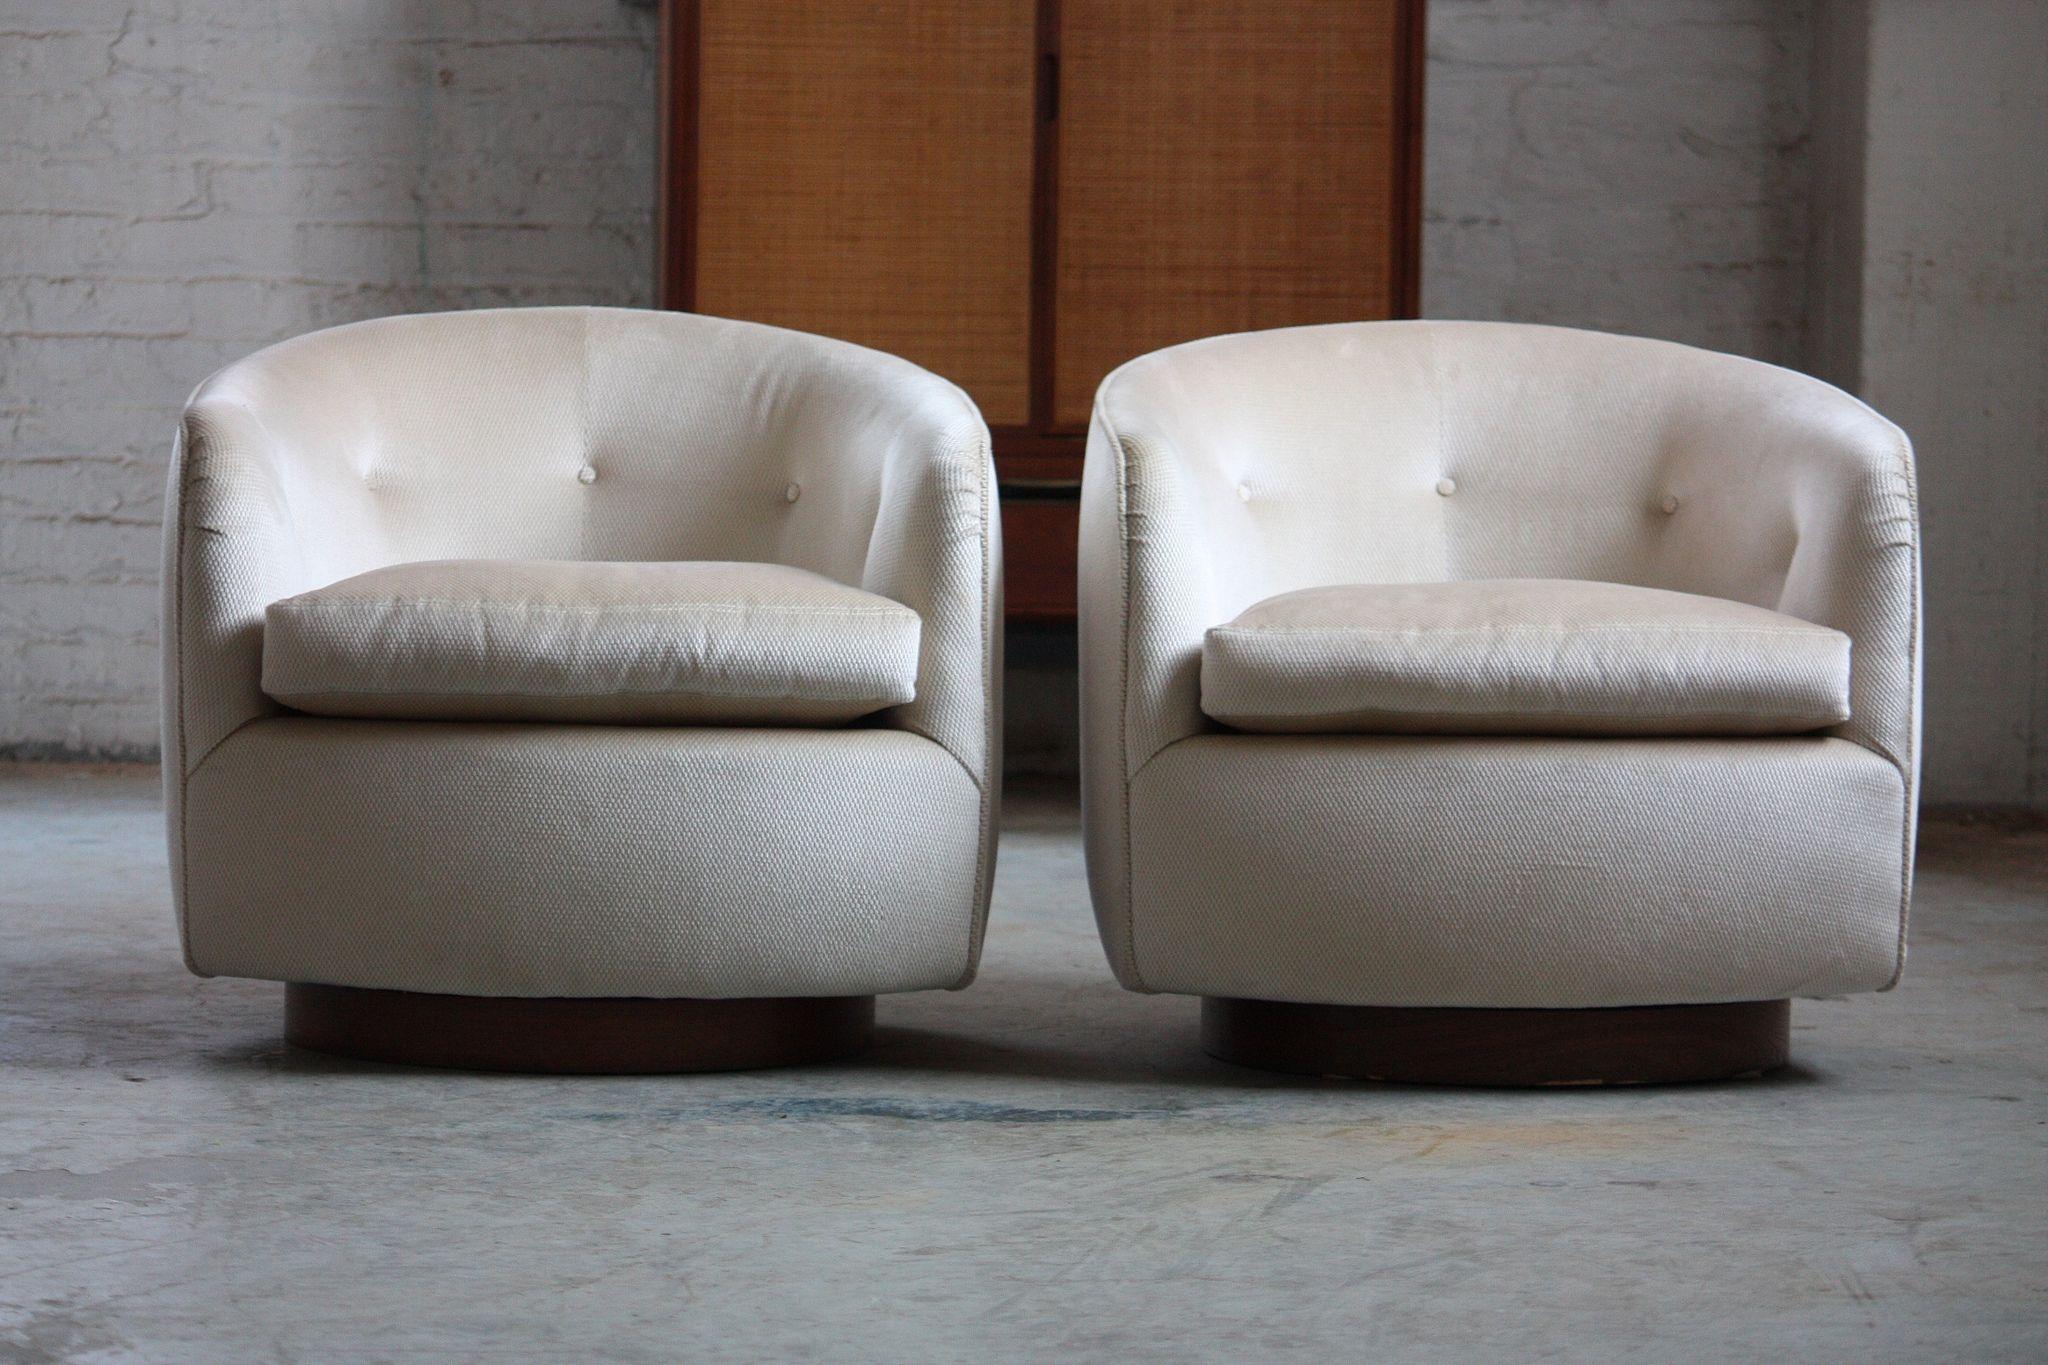 Attirant Ferocious Milo Baughman Mid Century Modern Swivel Rocker Barrel Club Chairs  (U.S.A., 1970s) | By Kennyk@k2modern.com